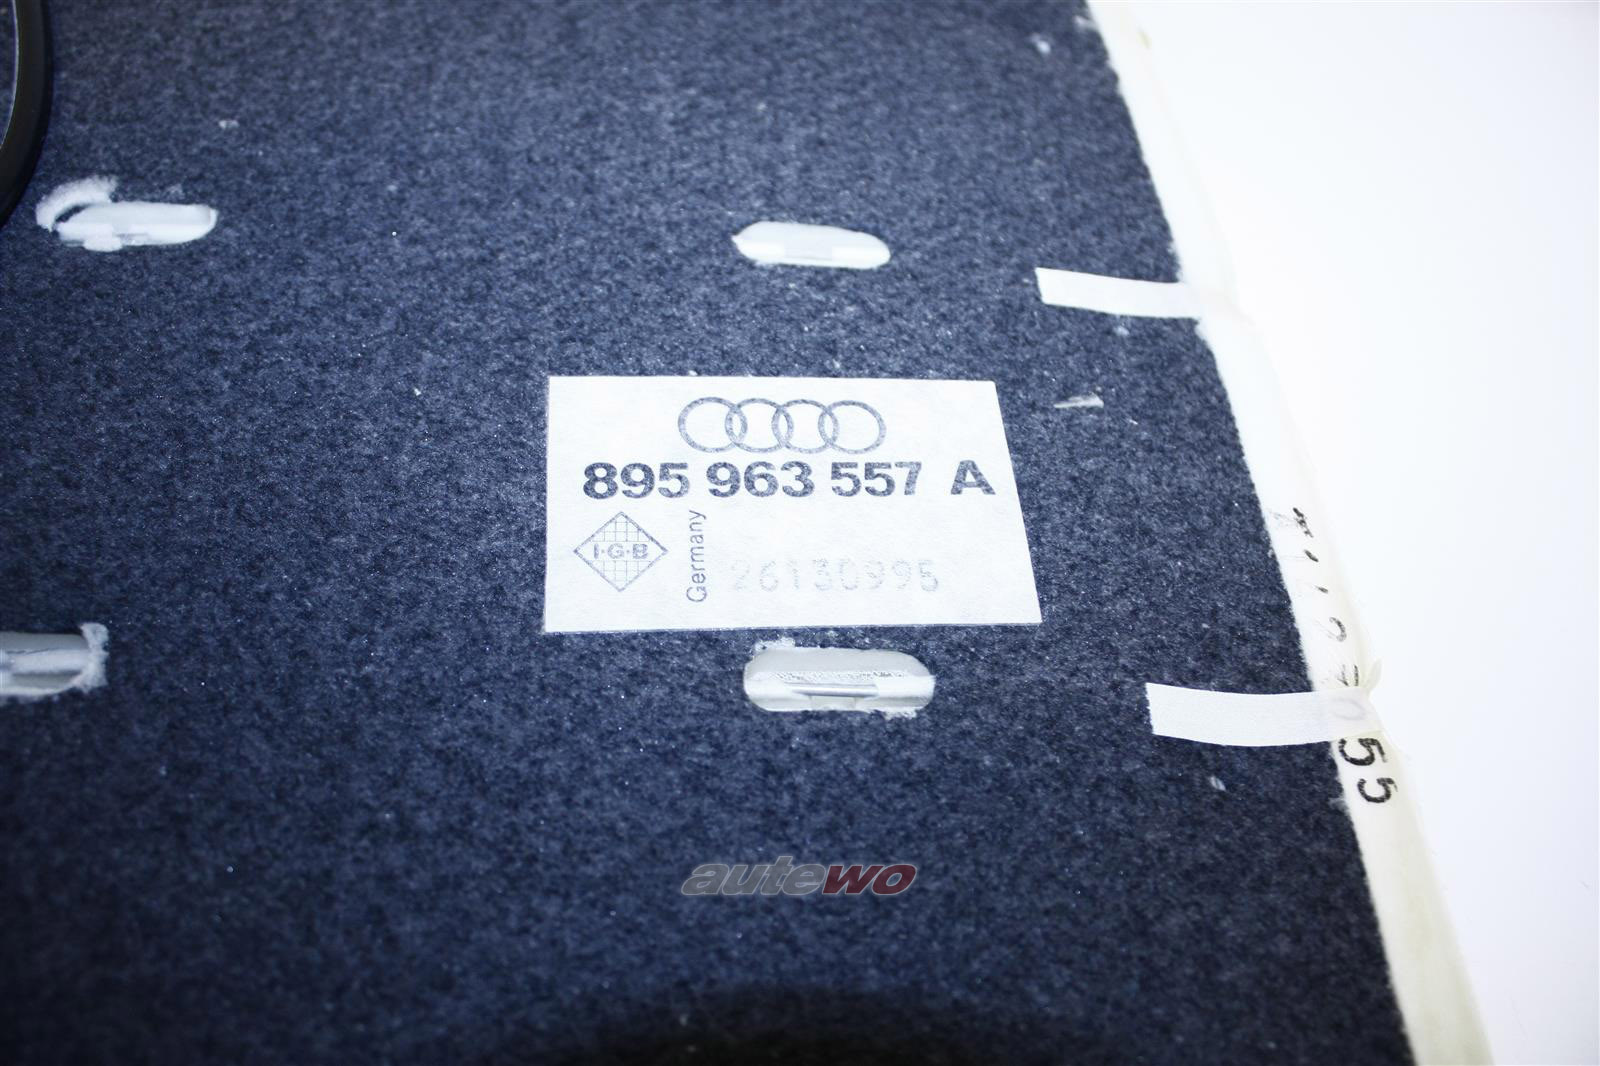 895963557A NEU Audi 80/90/Coupe/Cabrio Typ 89/B4 Lehnen-Heizelement Sitzheizung